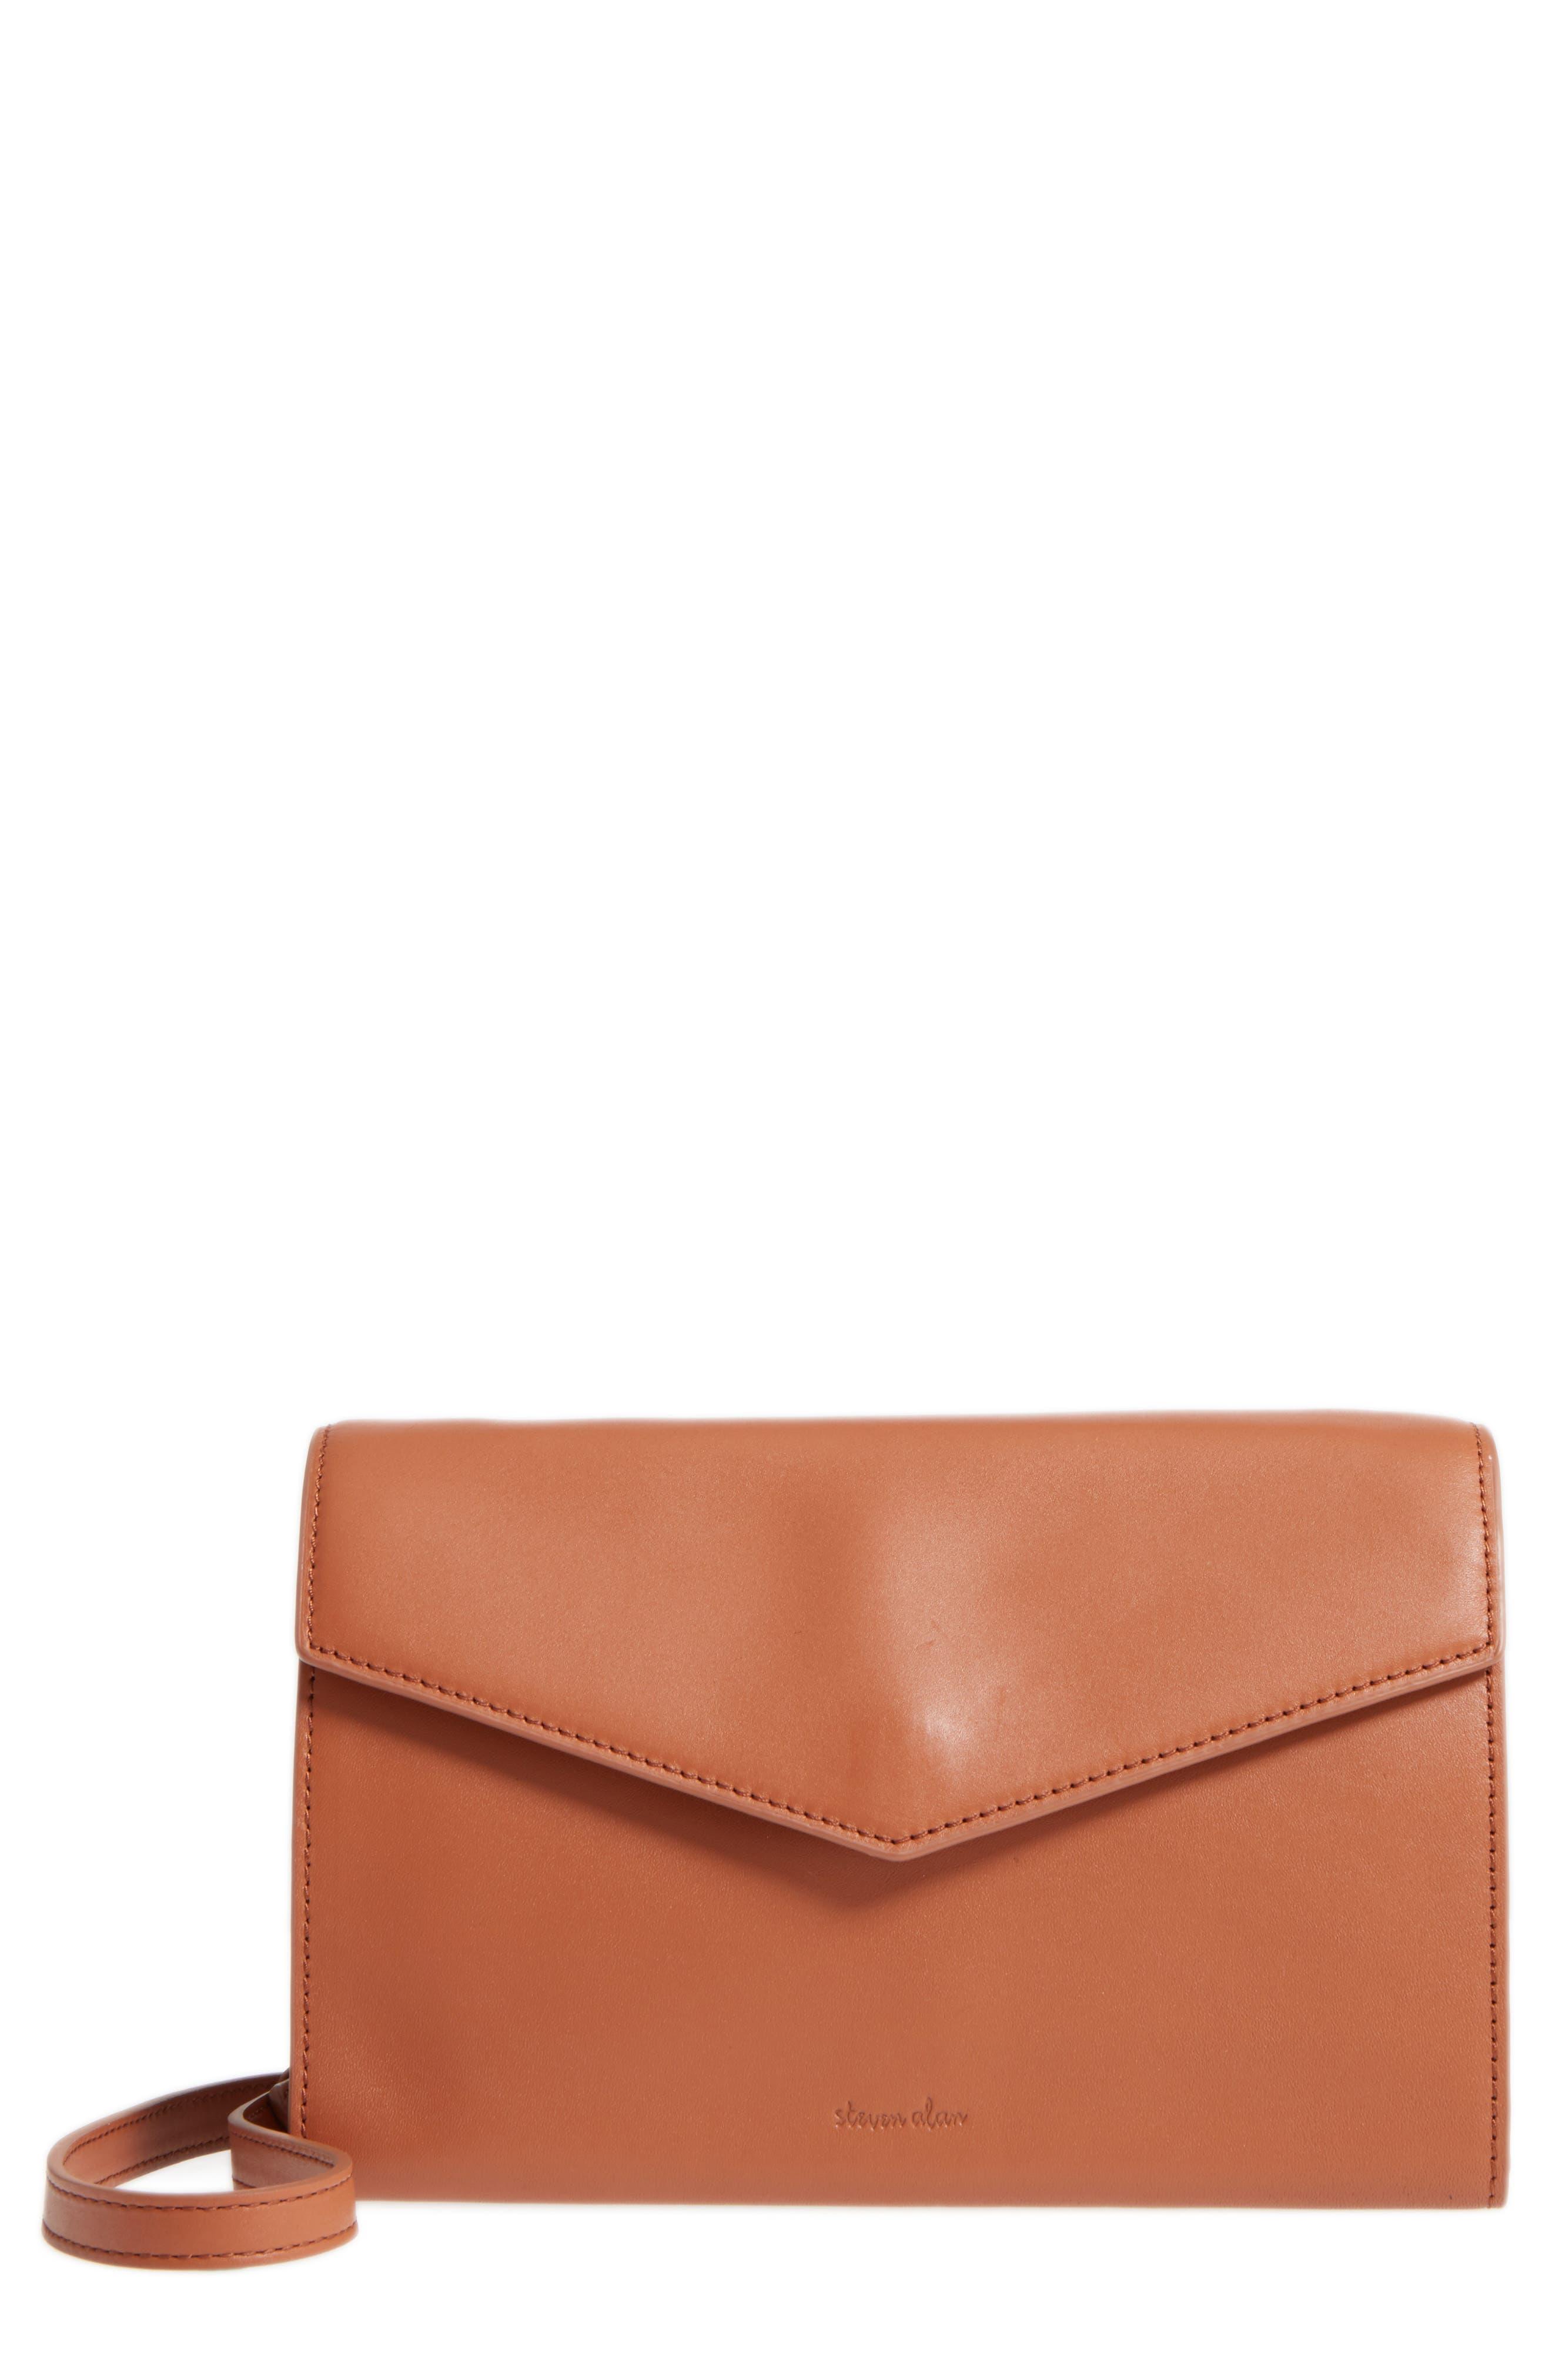 Easton Leather Envelope Crossbody Bag,                             Main thumbnail 1, color,                             200